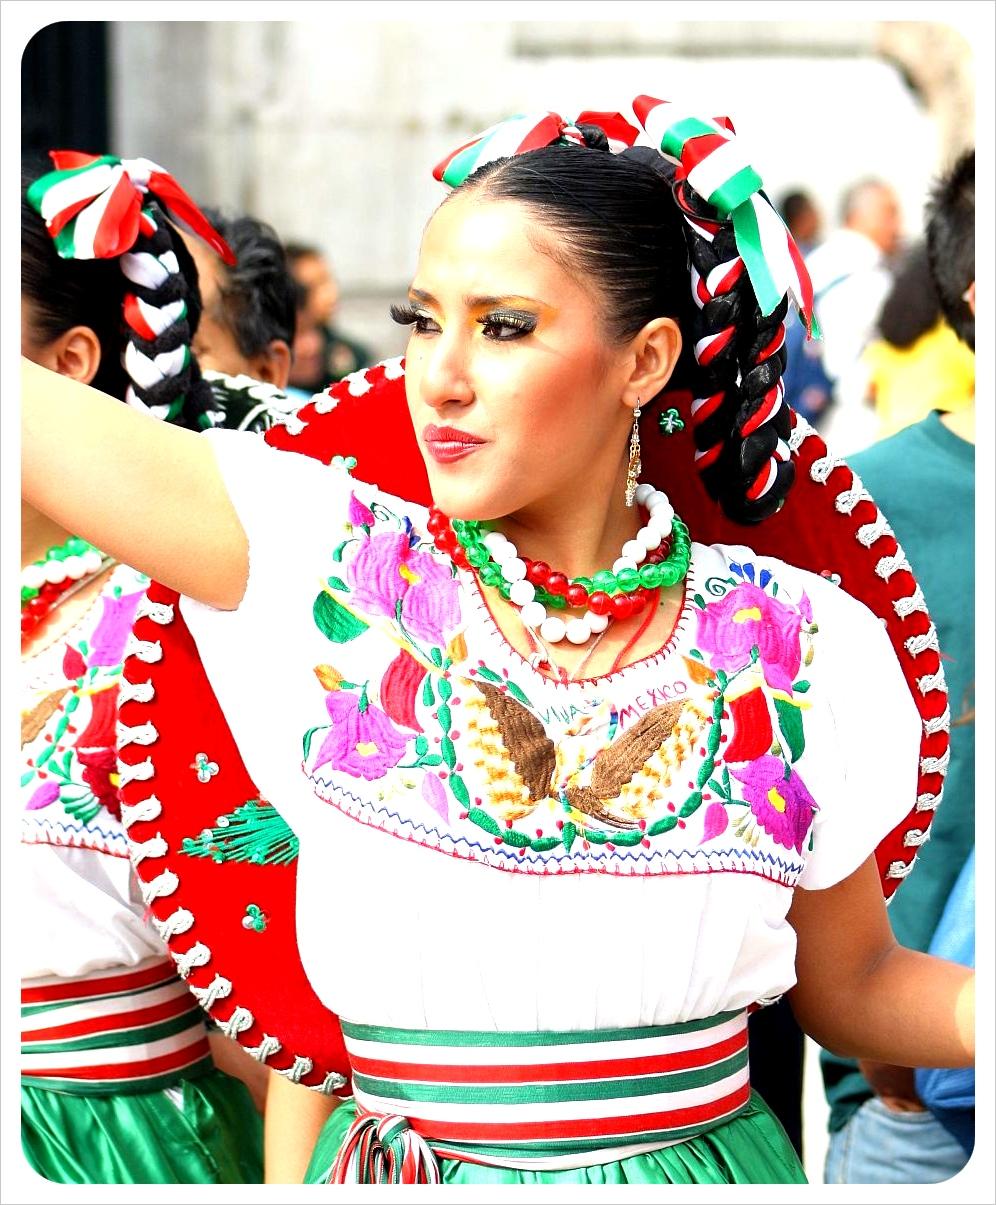 приведен список фото глыои мексиканке чаша была